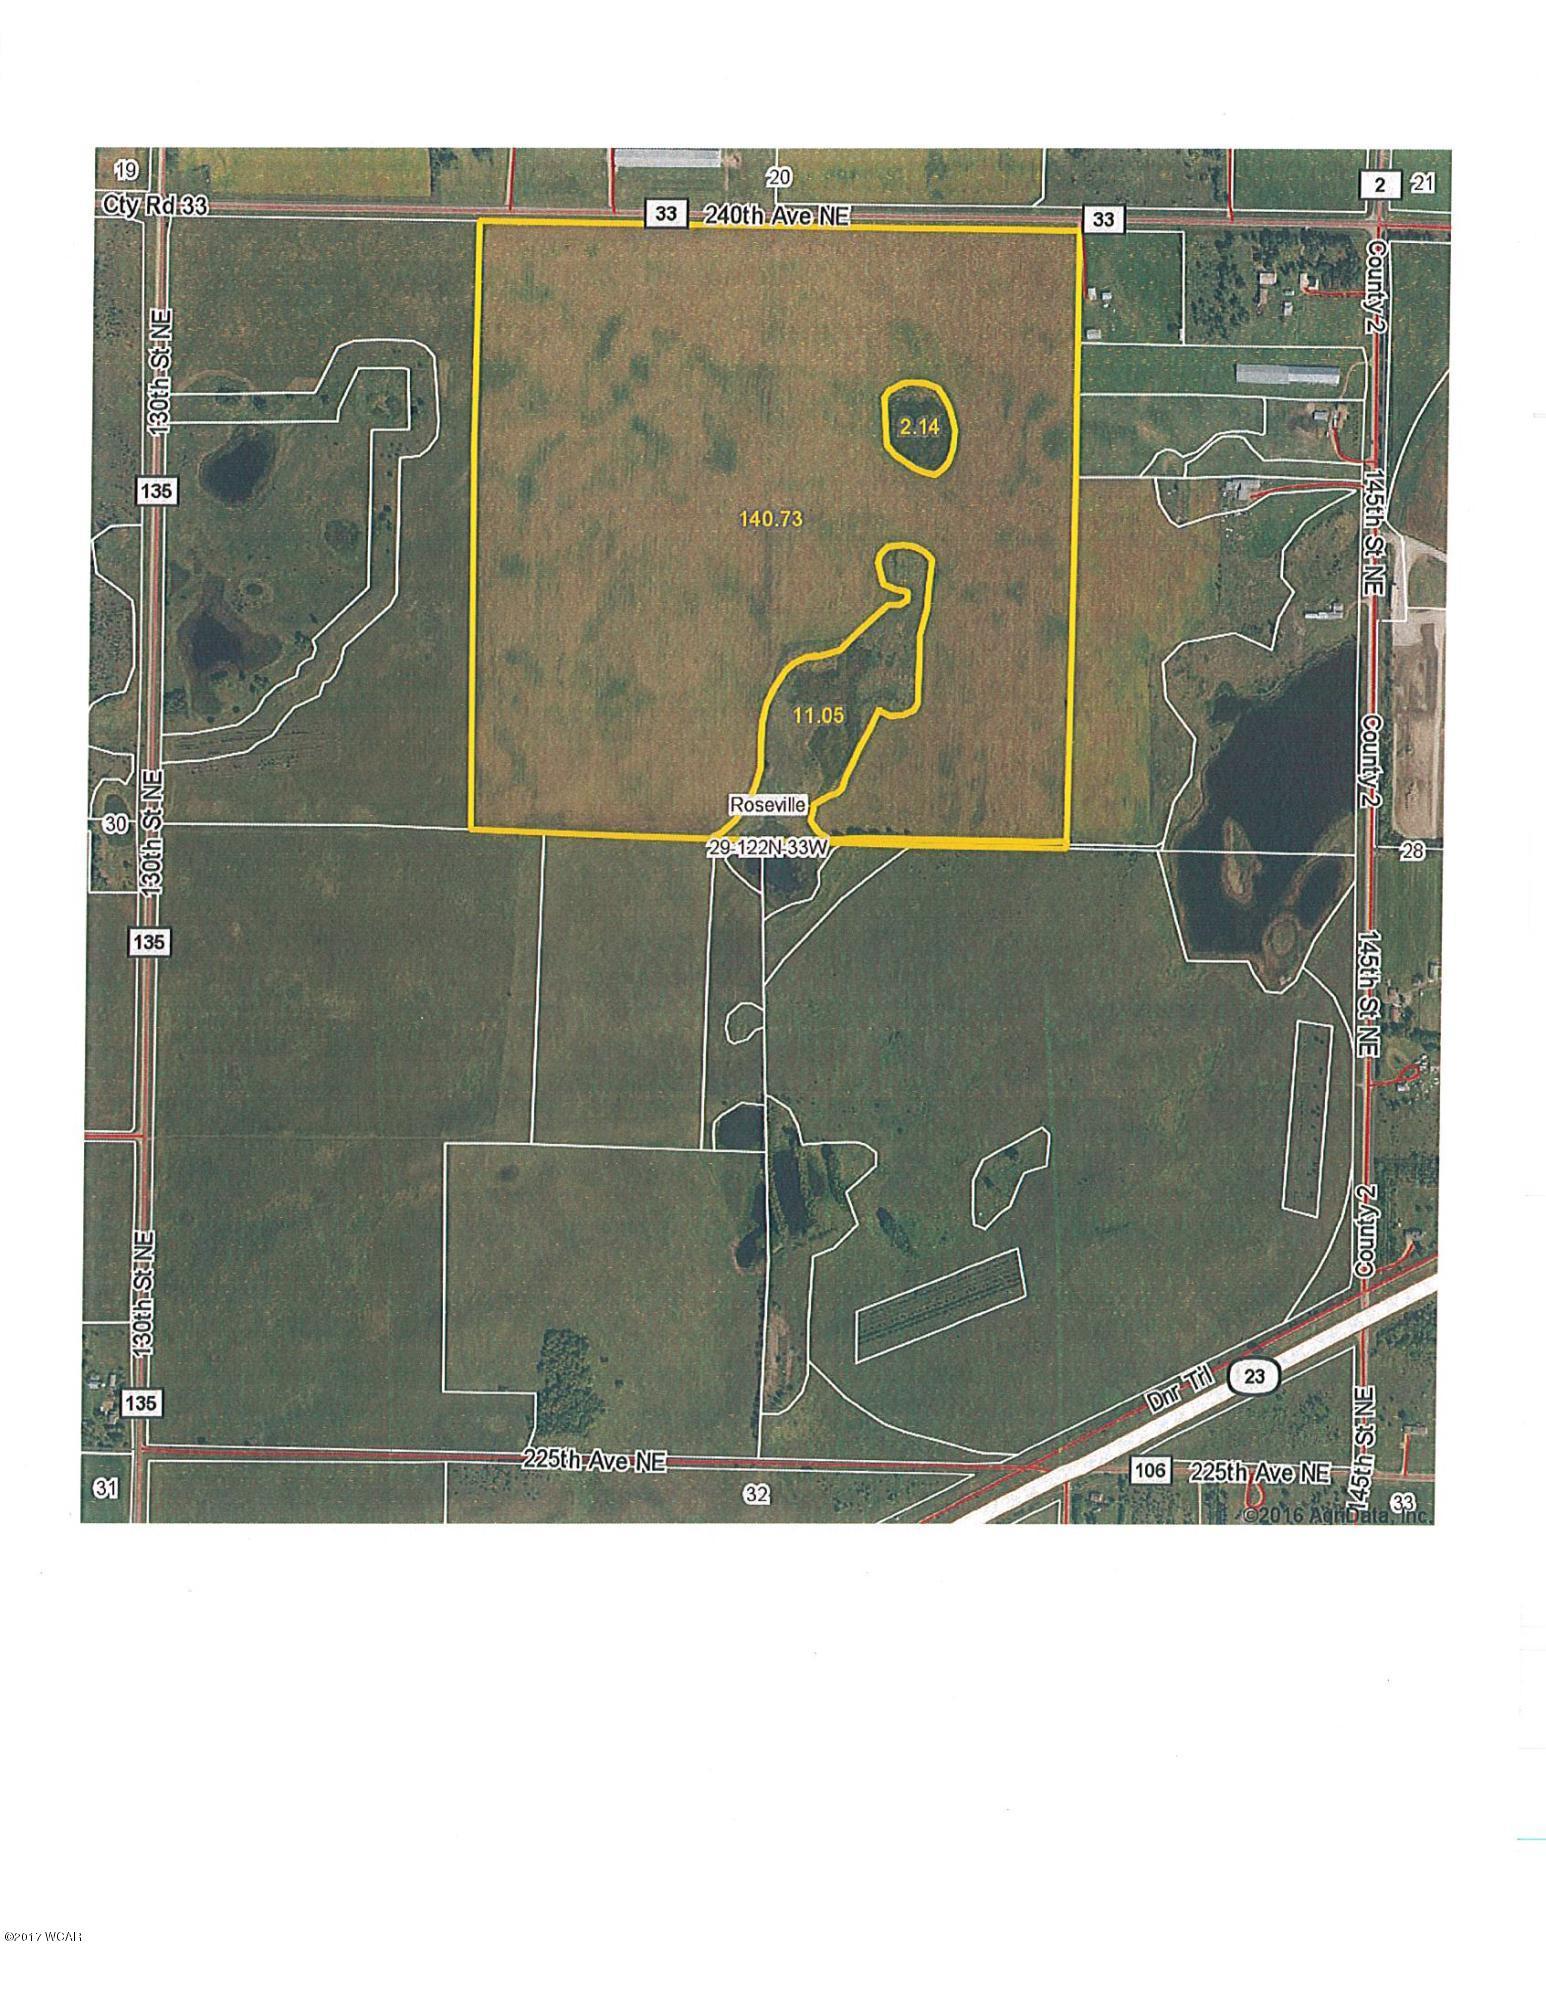 Xx Section 29 Roseville Township,New London,Agriculture,Section 29 Roseville Township,6025842